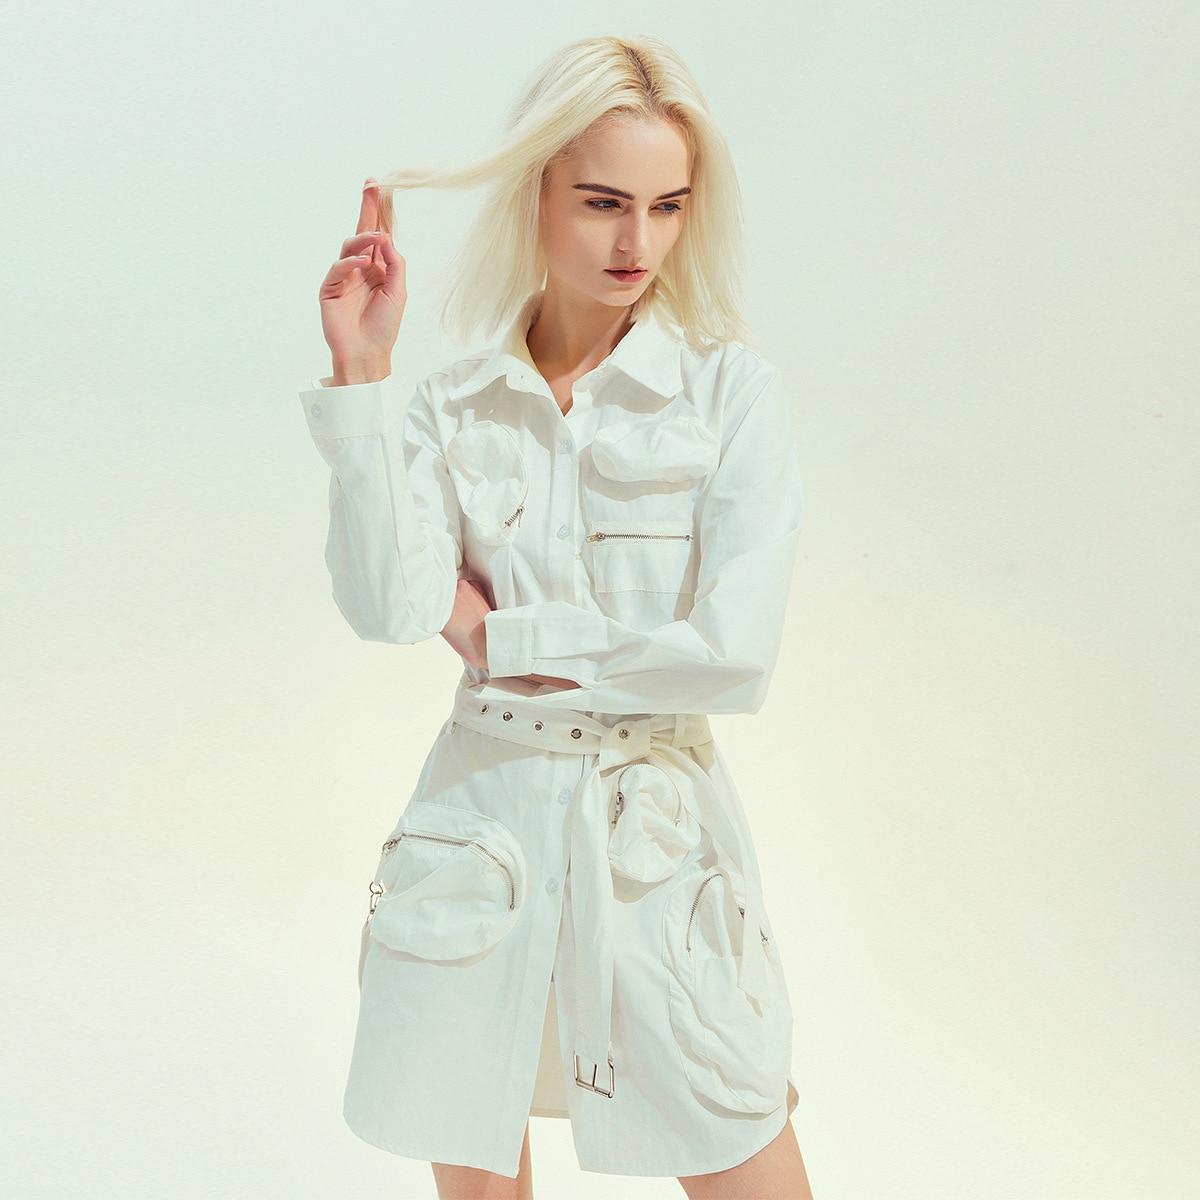 Asymmetric Cargo Dress with Belt Women Solid White 2020 Spring Elegant Pocket Single Breasted Casual Slim Shirt Dress SA210S30